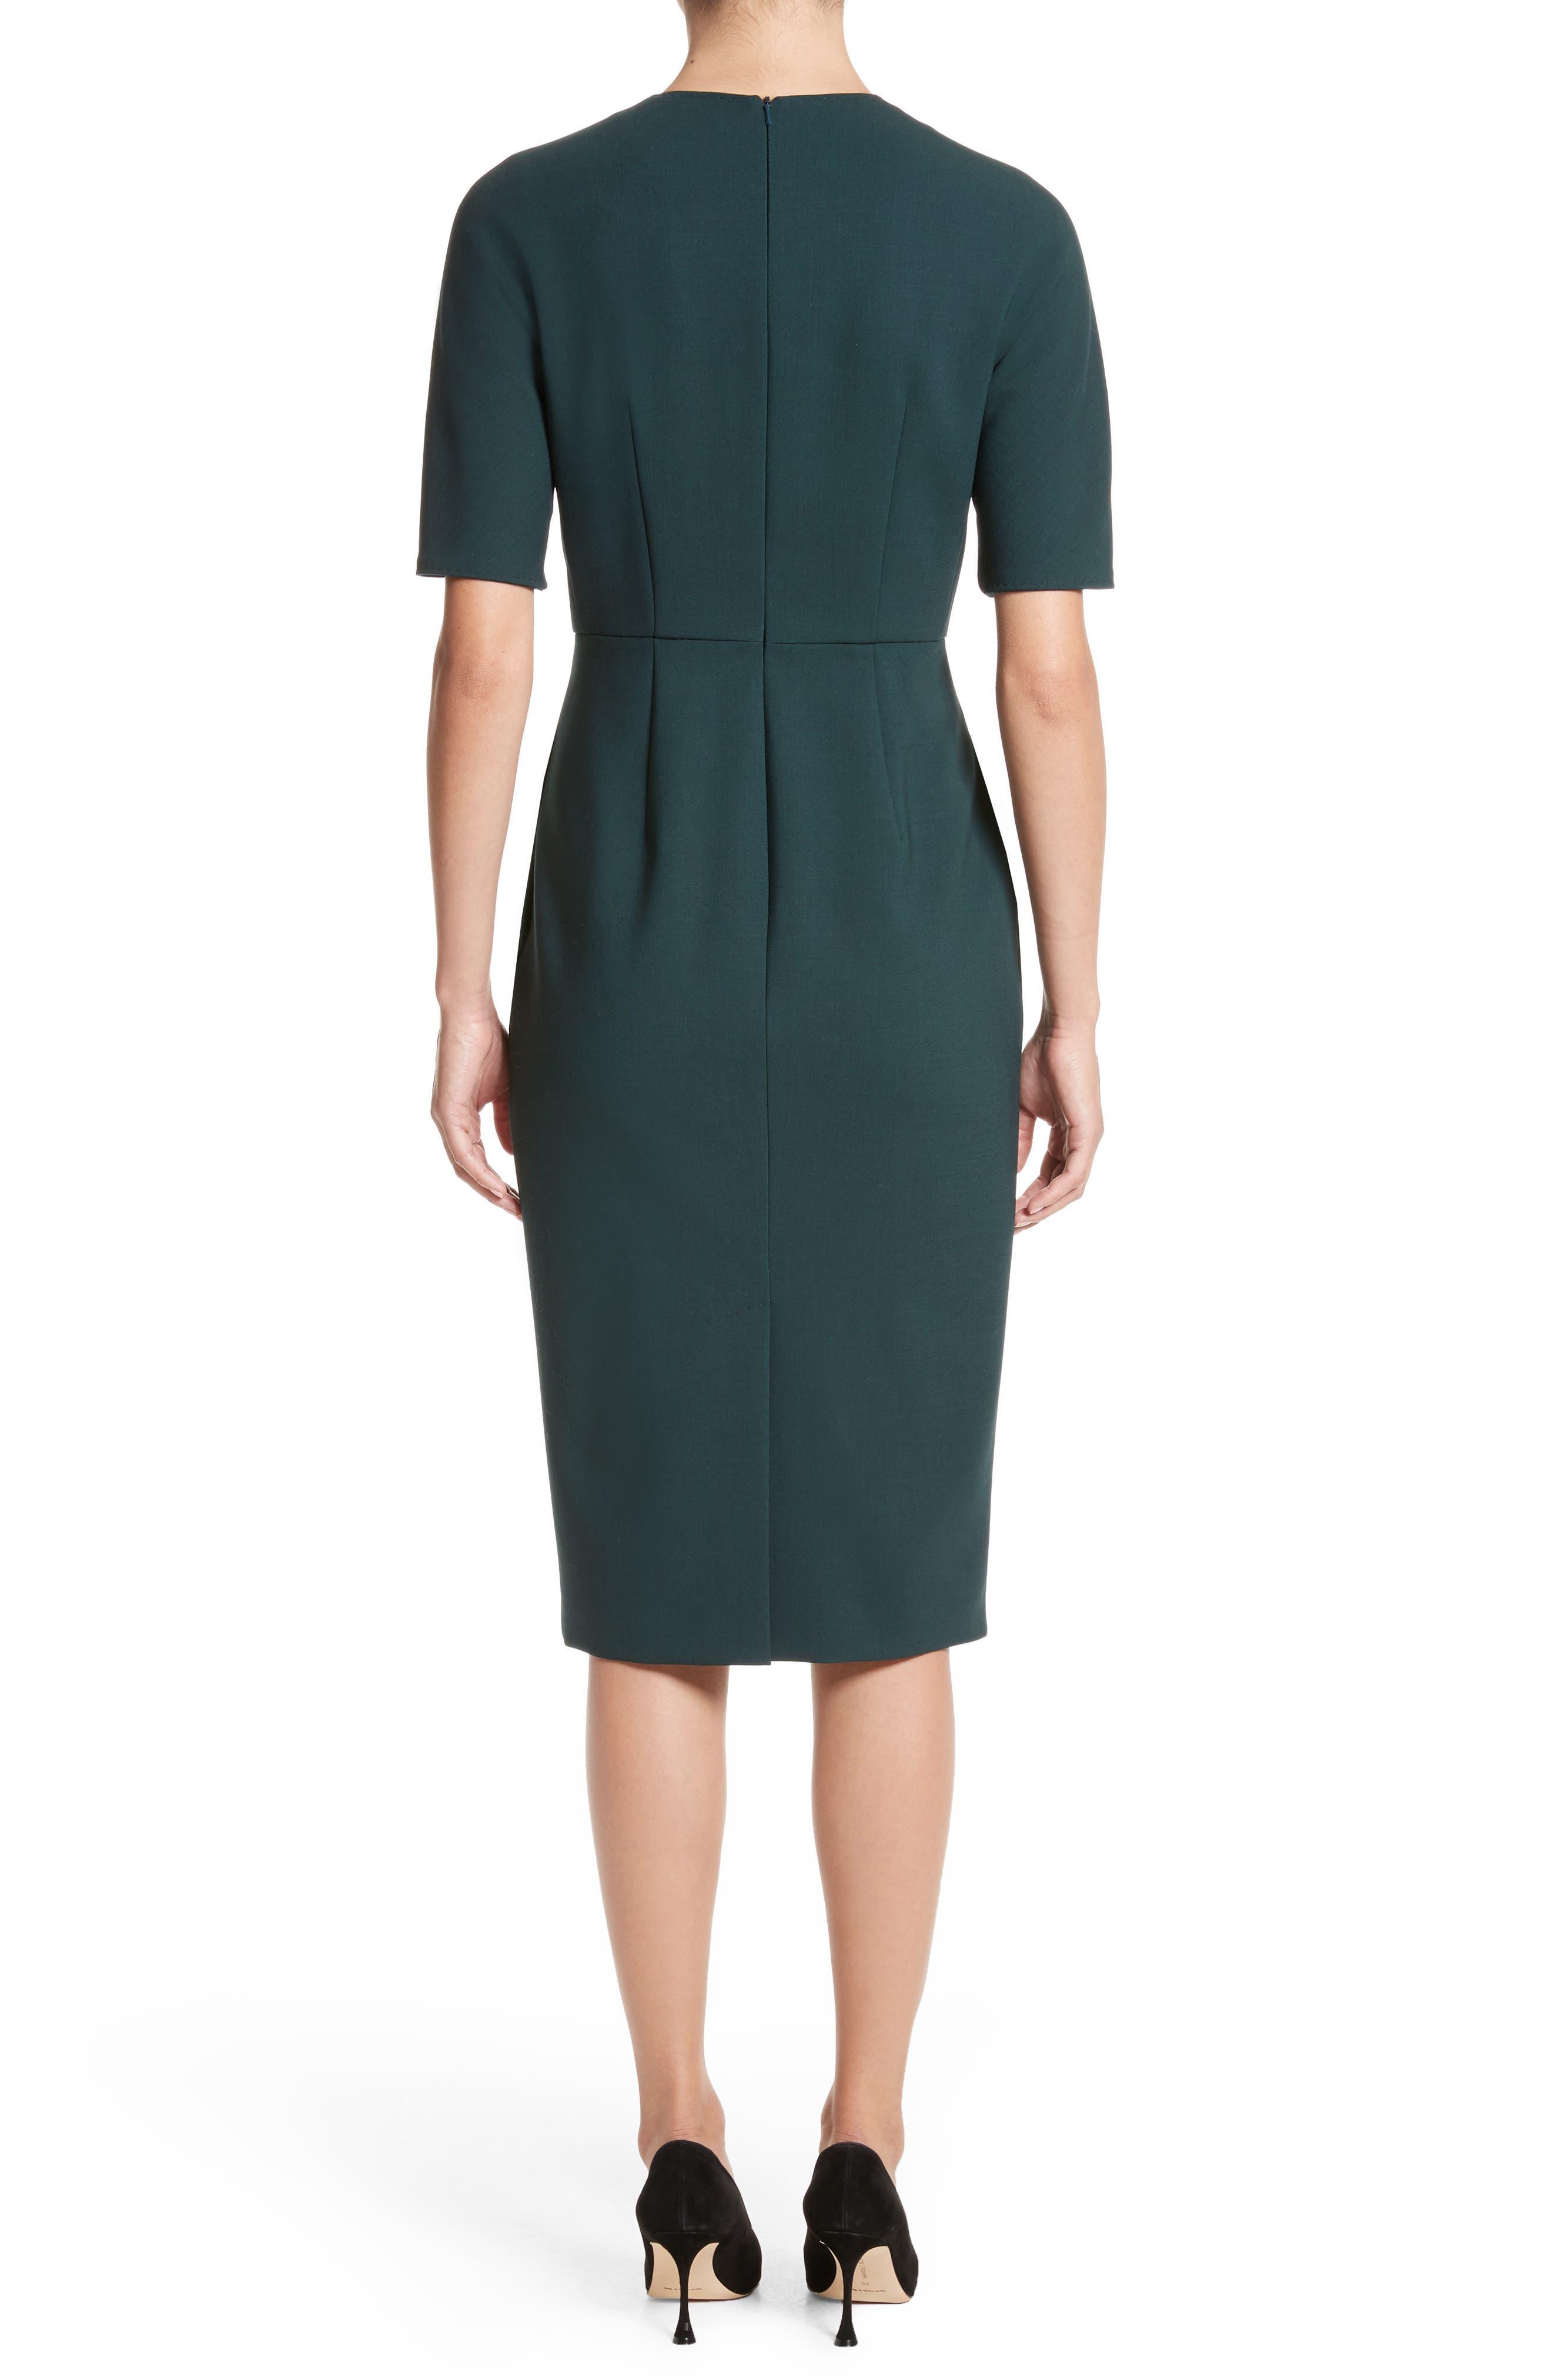 Umano Stretch Wool Sheath Dress,                             Alternate thumbnail 2, color,                             Dark Green